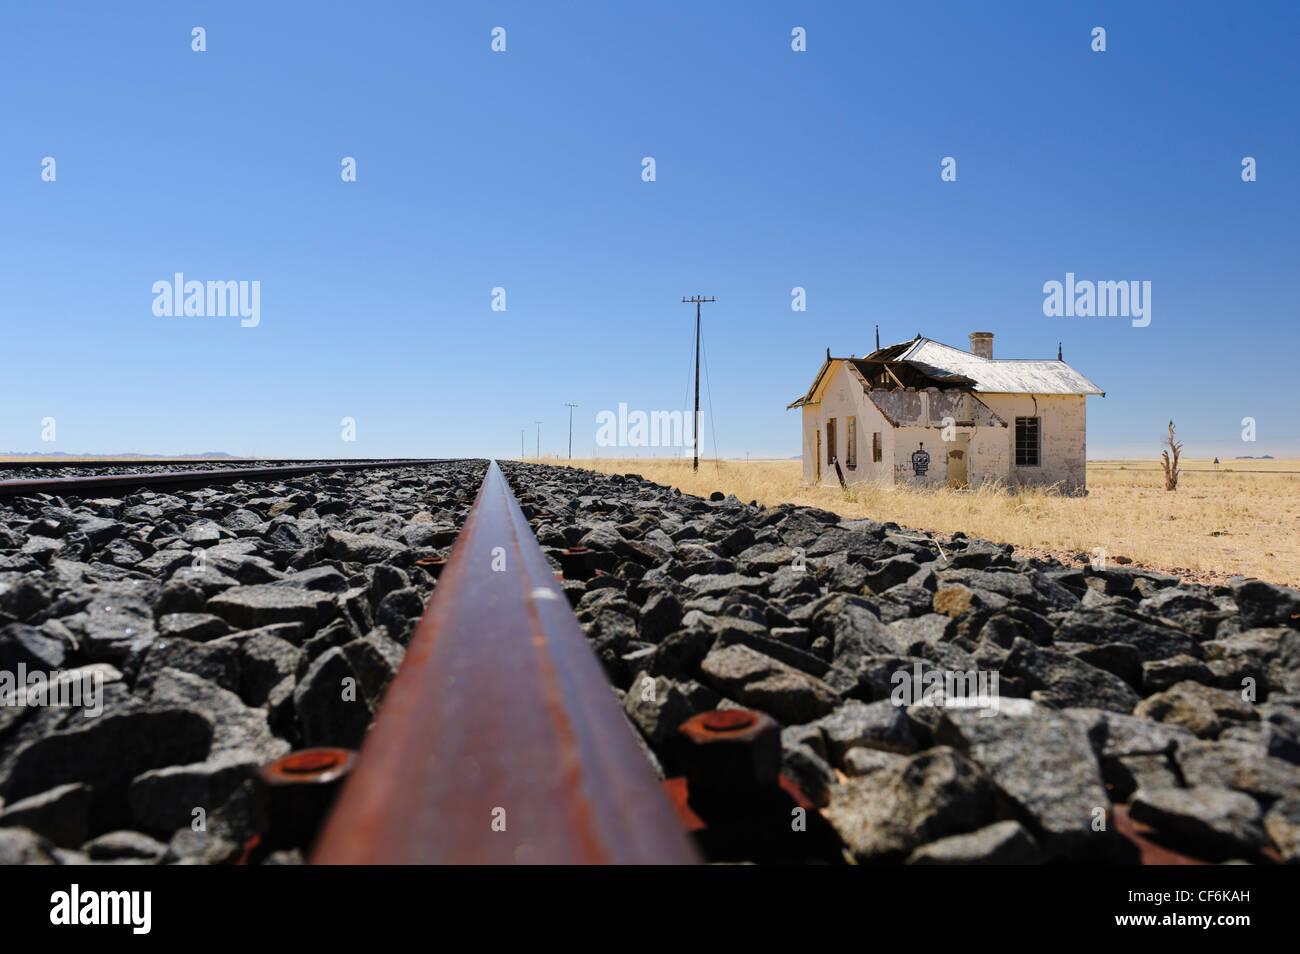 The new 'Aus to Luderitz' railway at the old Garub railway station. Southern Namibia. - Stock Image